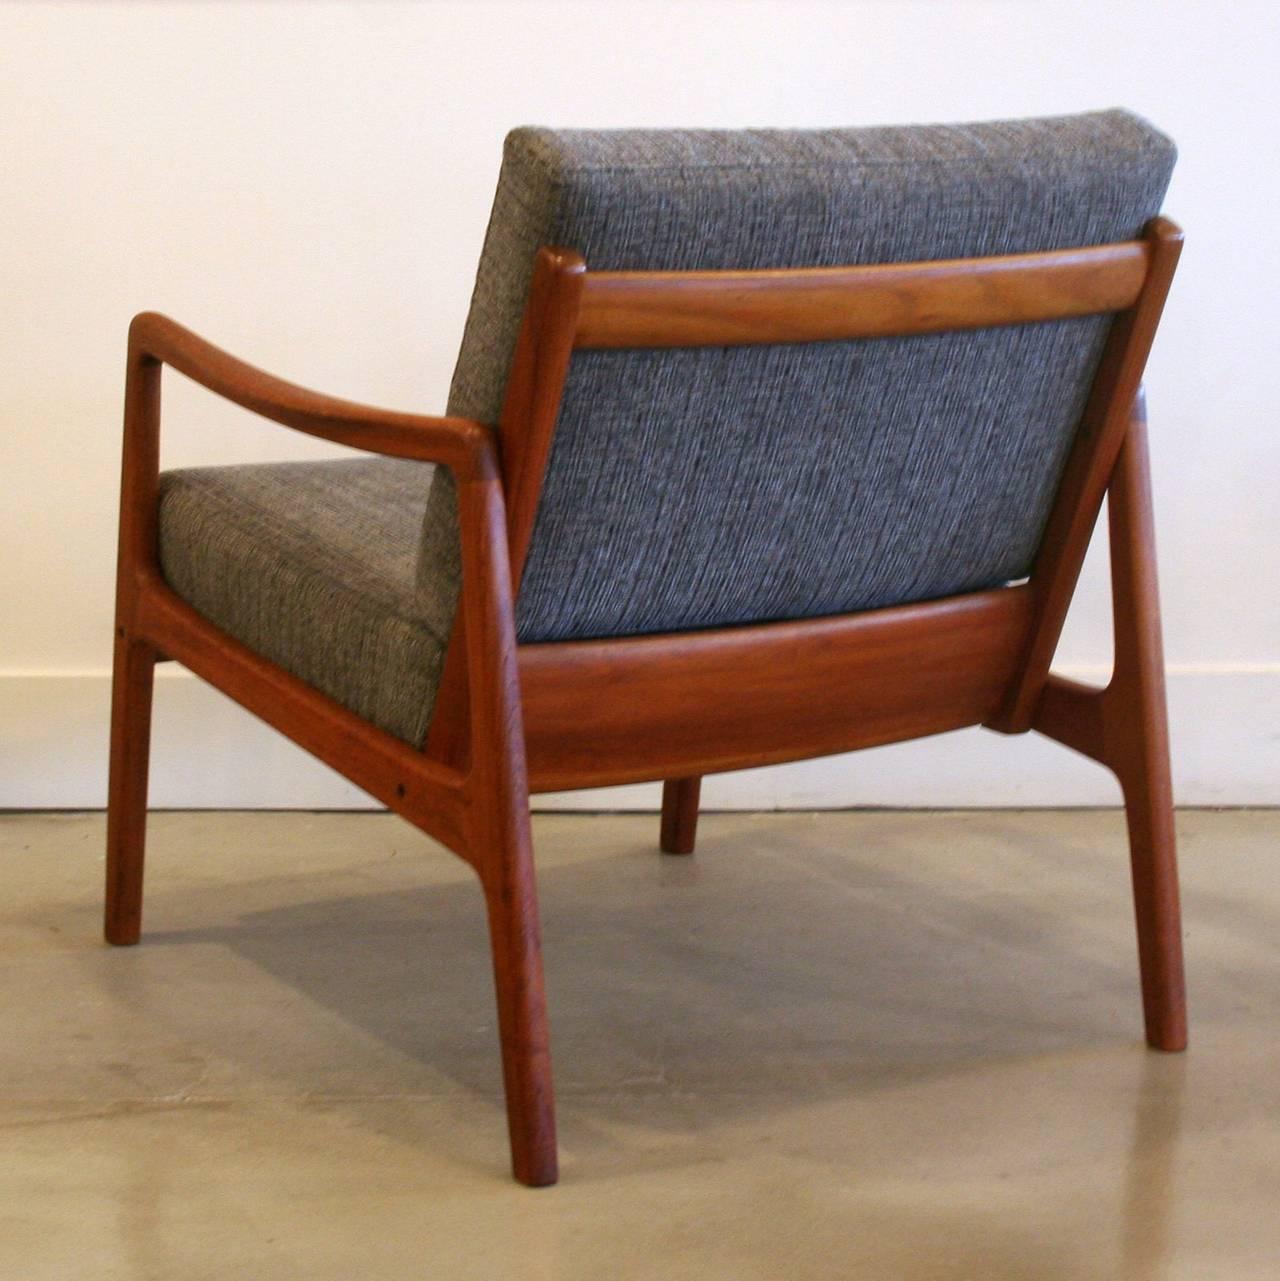 Vintage Danish Teak Lounge Chair Pair Available at 1stdibs